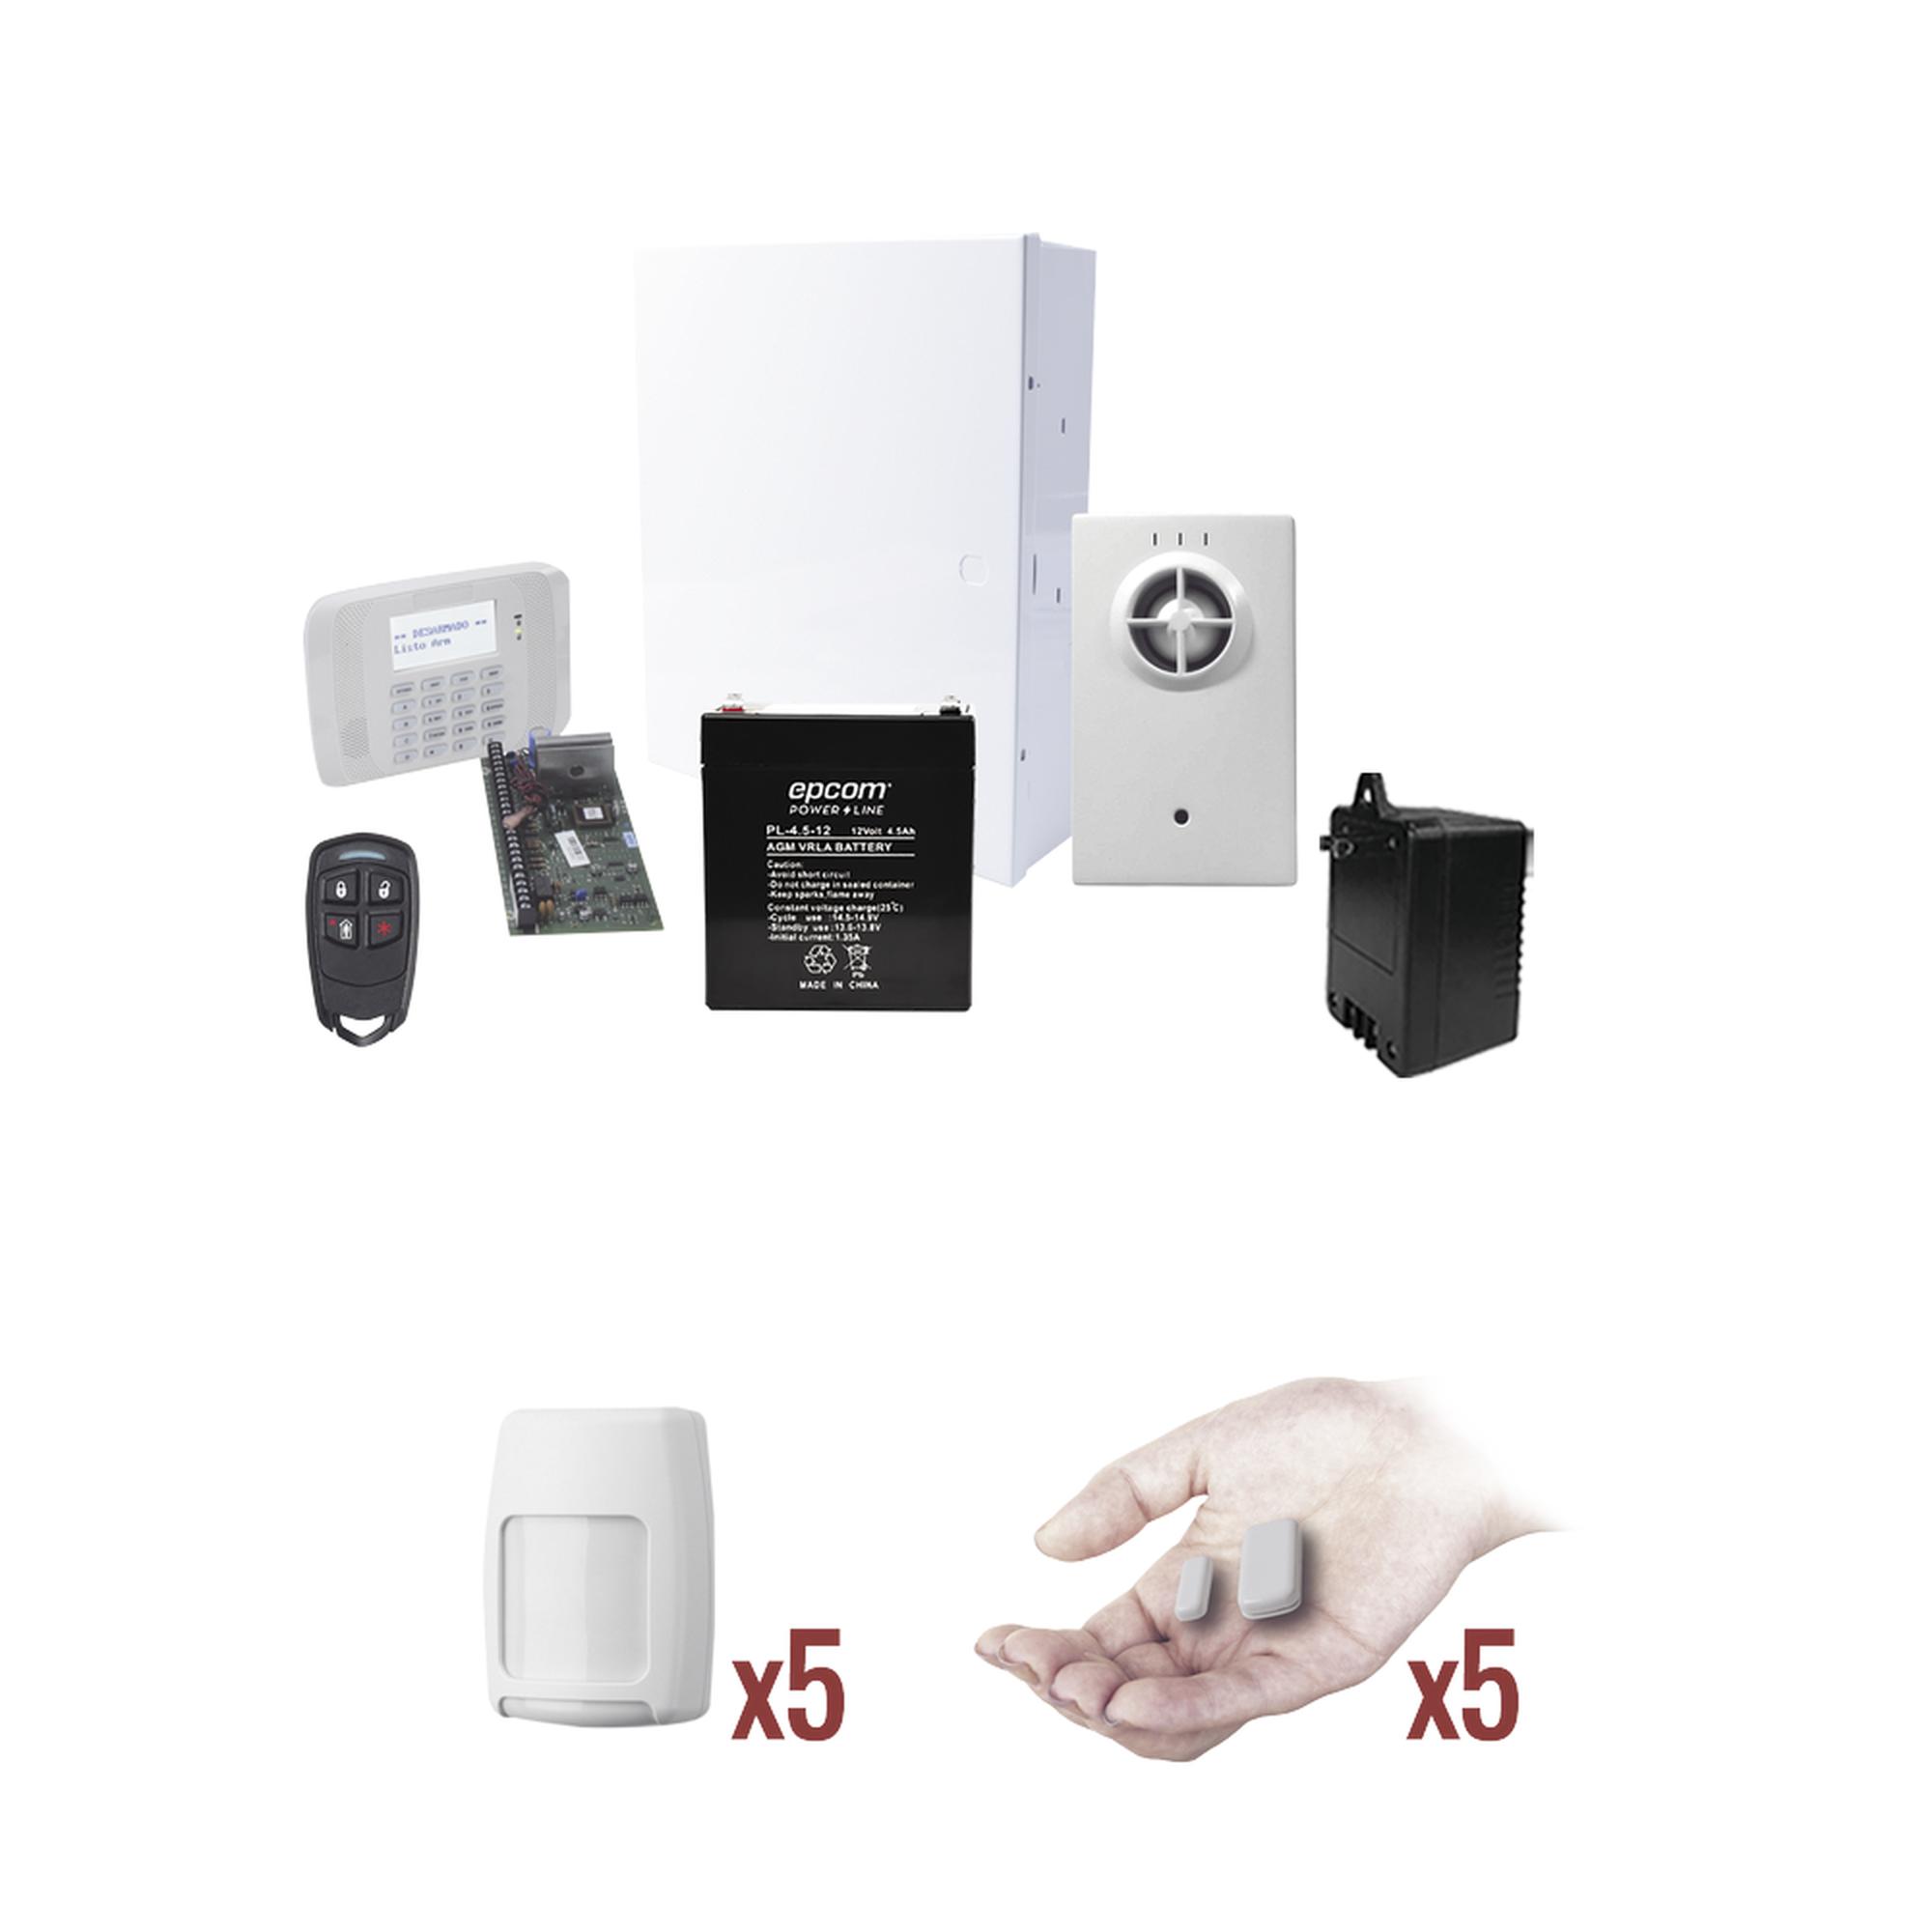 KIT VISTA48PROTEGE1 (Kit de Panel de Alarma con sensores totalmente inalambricos)